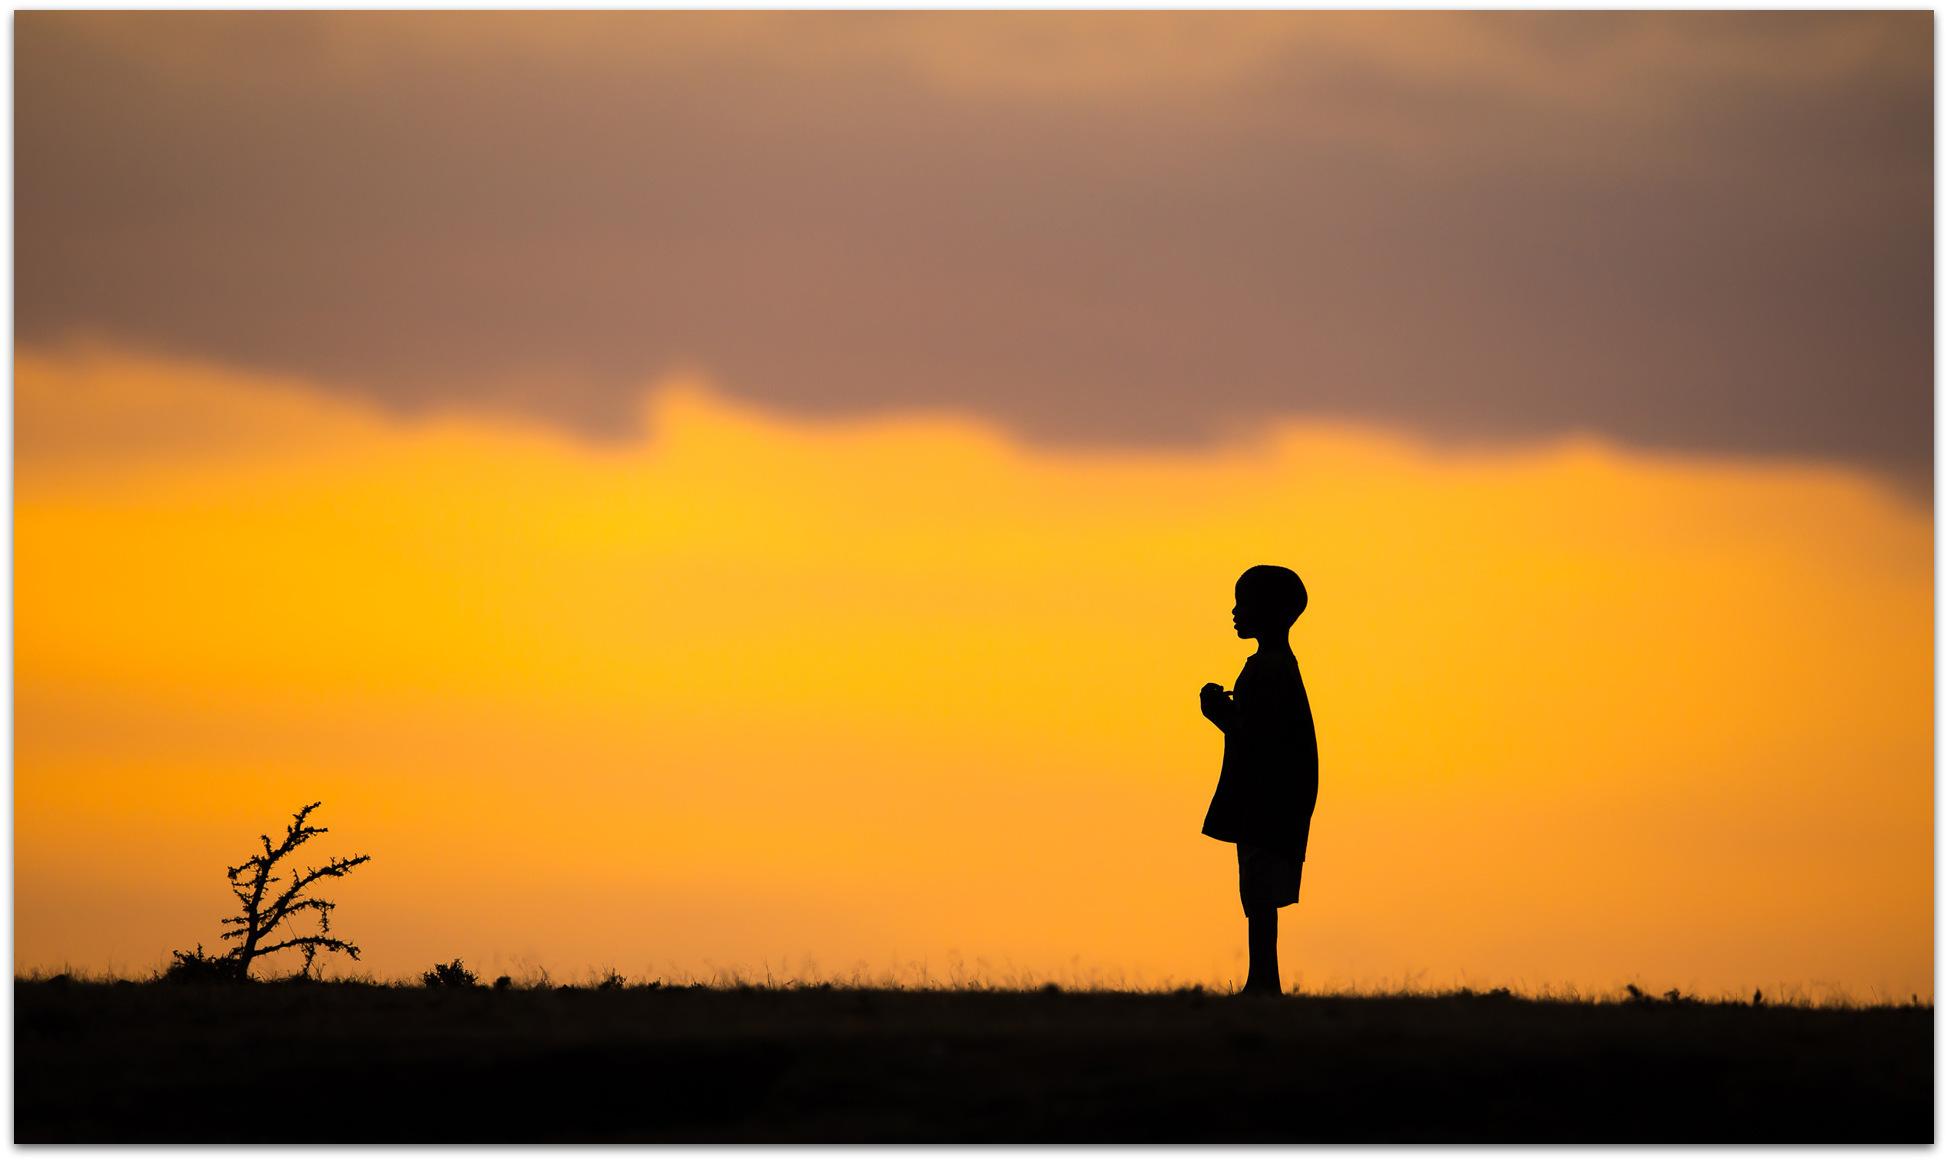 Maasai child against sunset in Maasai Mara